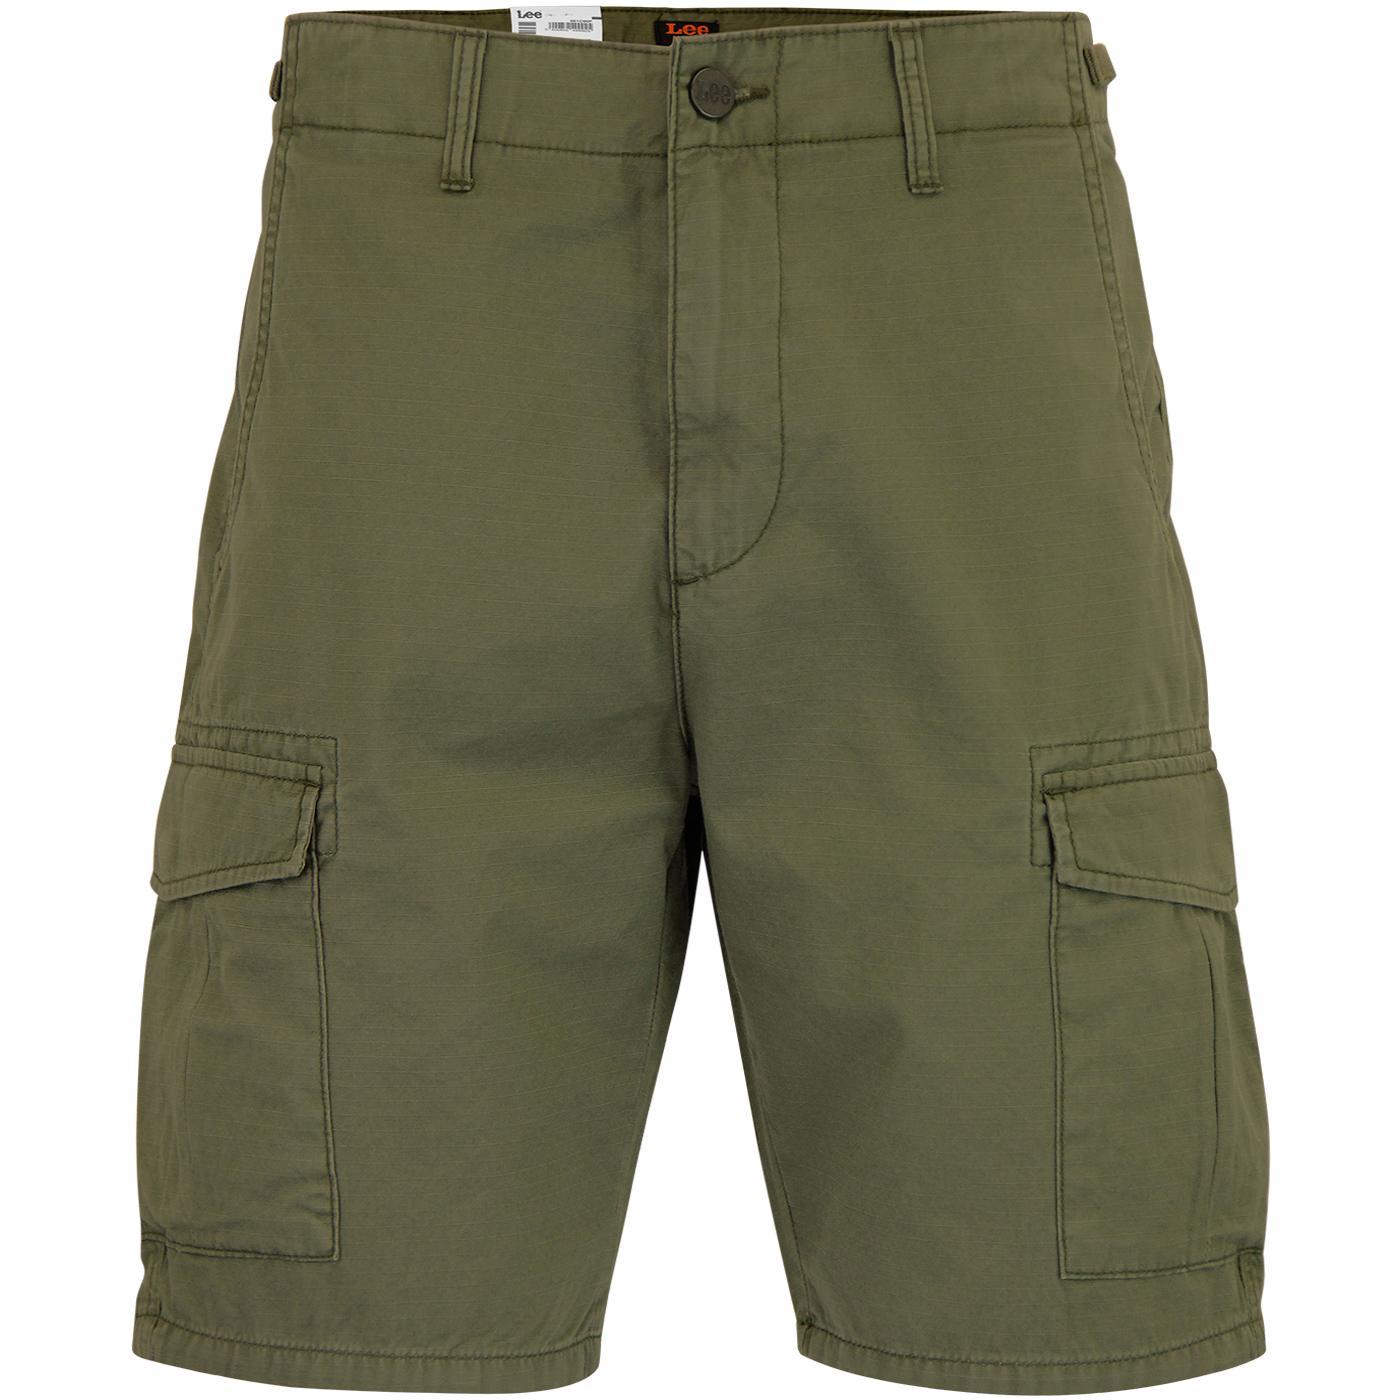 LEE JEANS Retro Military Fatigue Cargo Shorts (K)